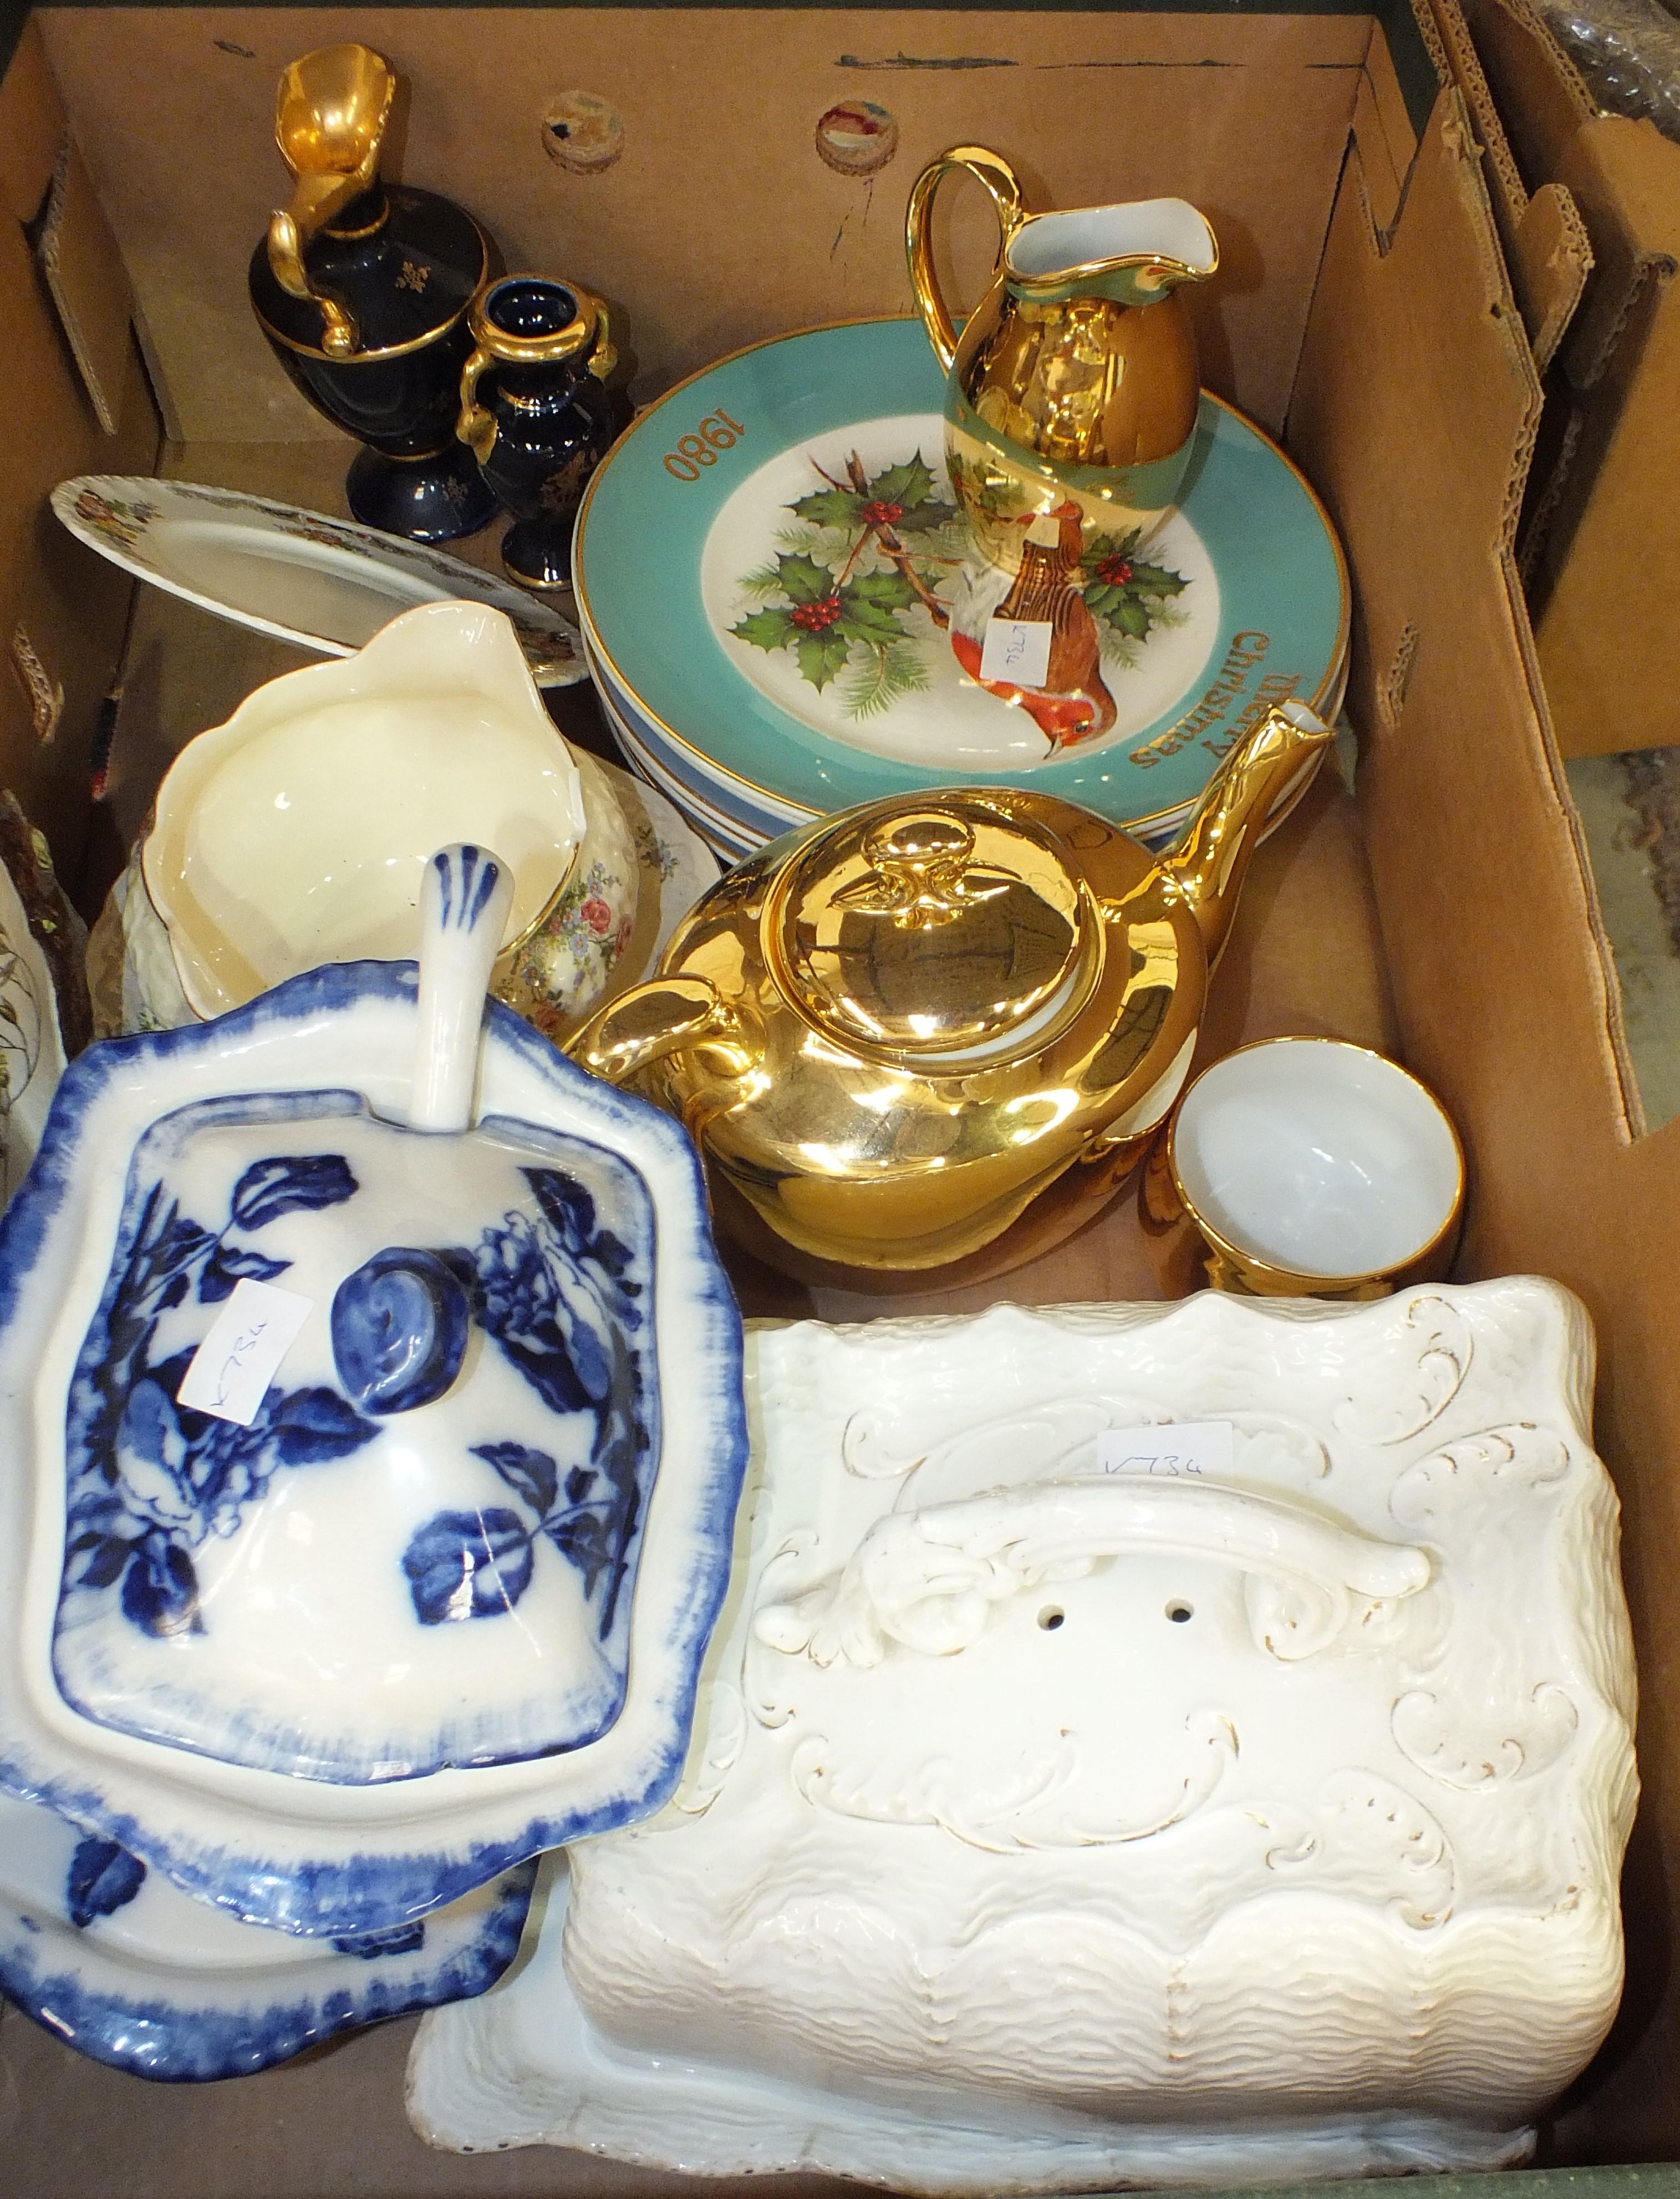 Lot 102 - A Doulton Lambeth stoneware Queen Victoria commemorative jug, a collection of Royal Albert Old